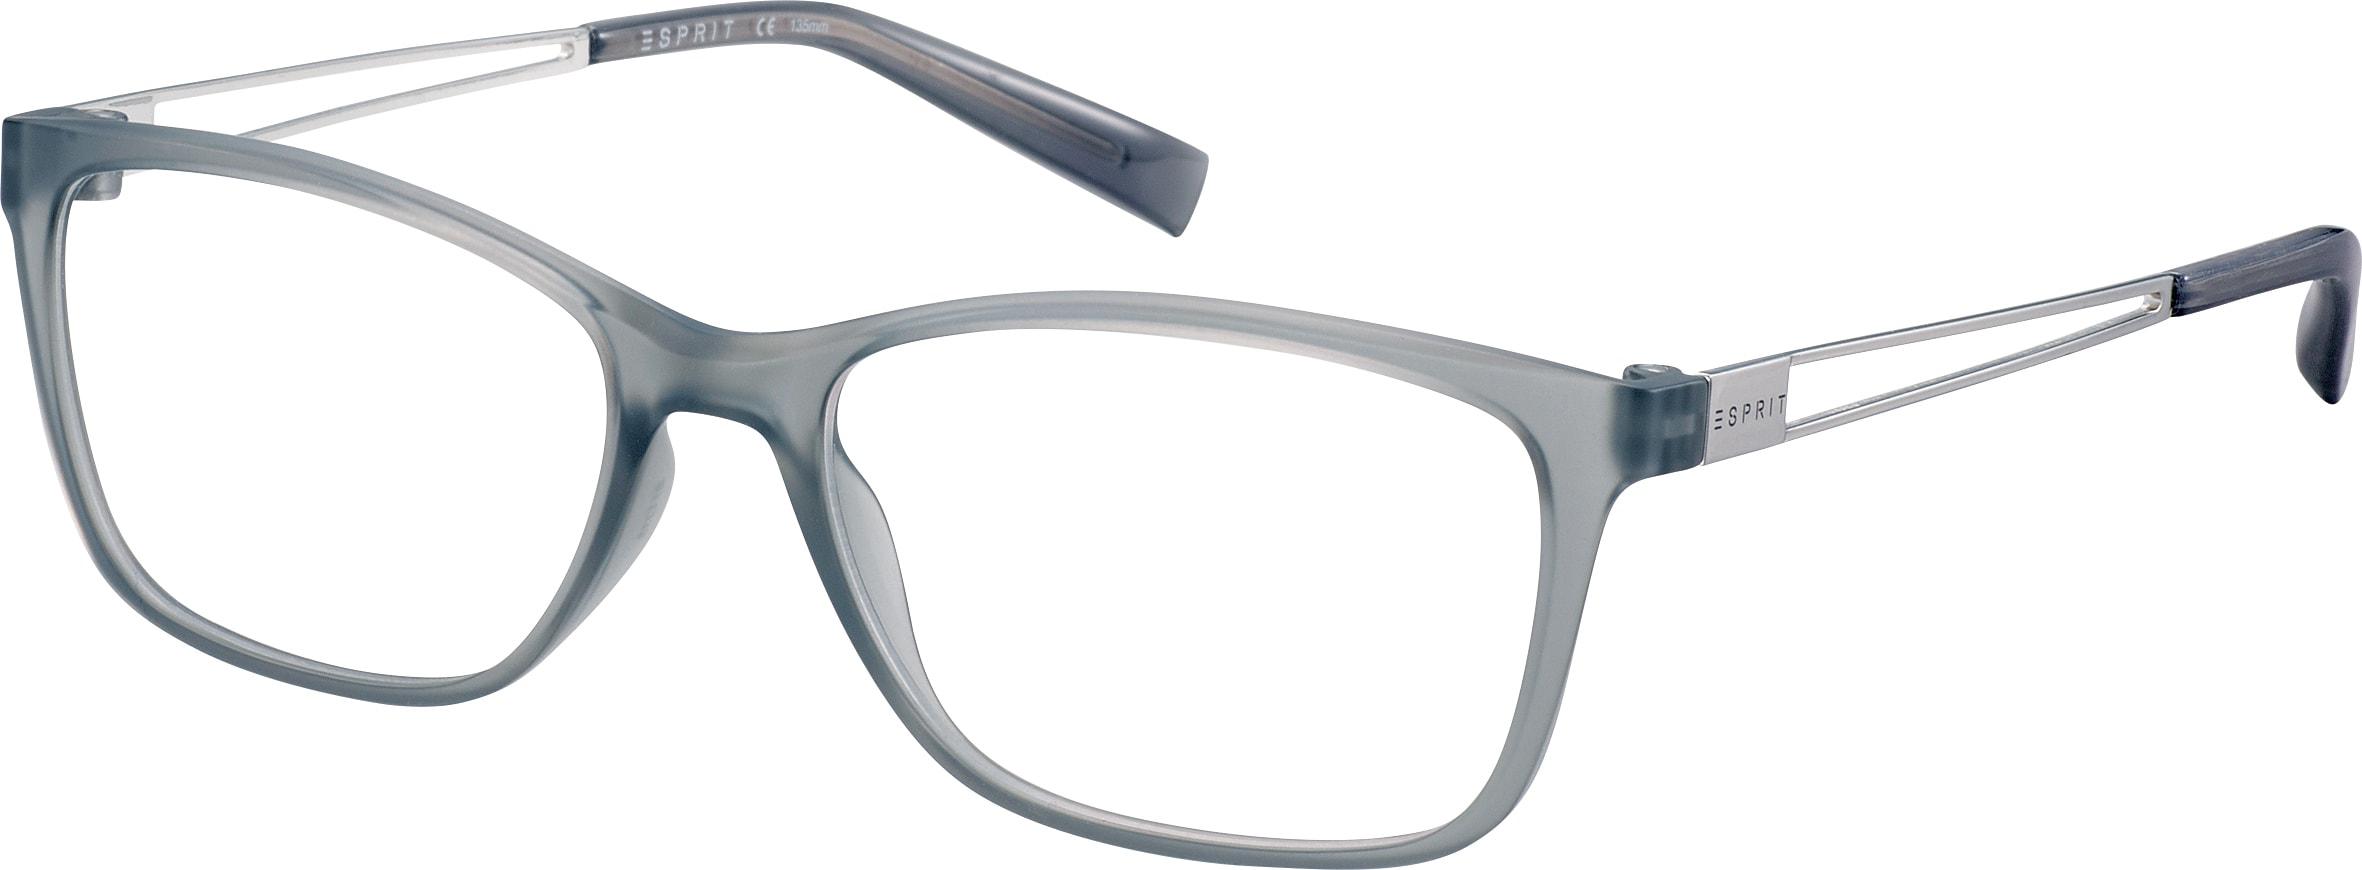 Esprit Damen Brille » ET17562«, grau, 505 - grau